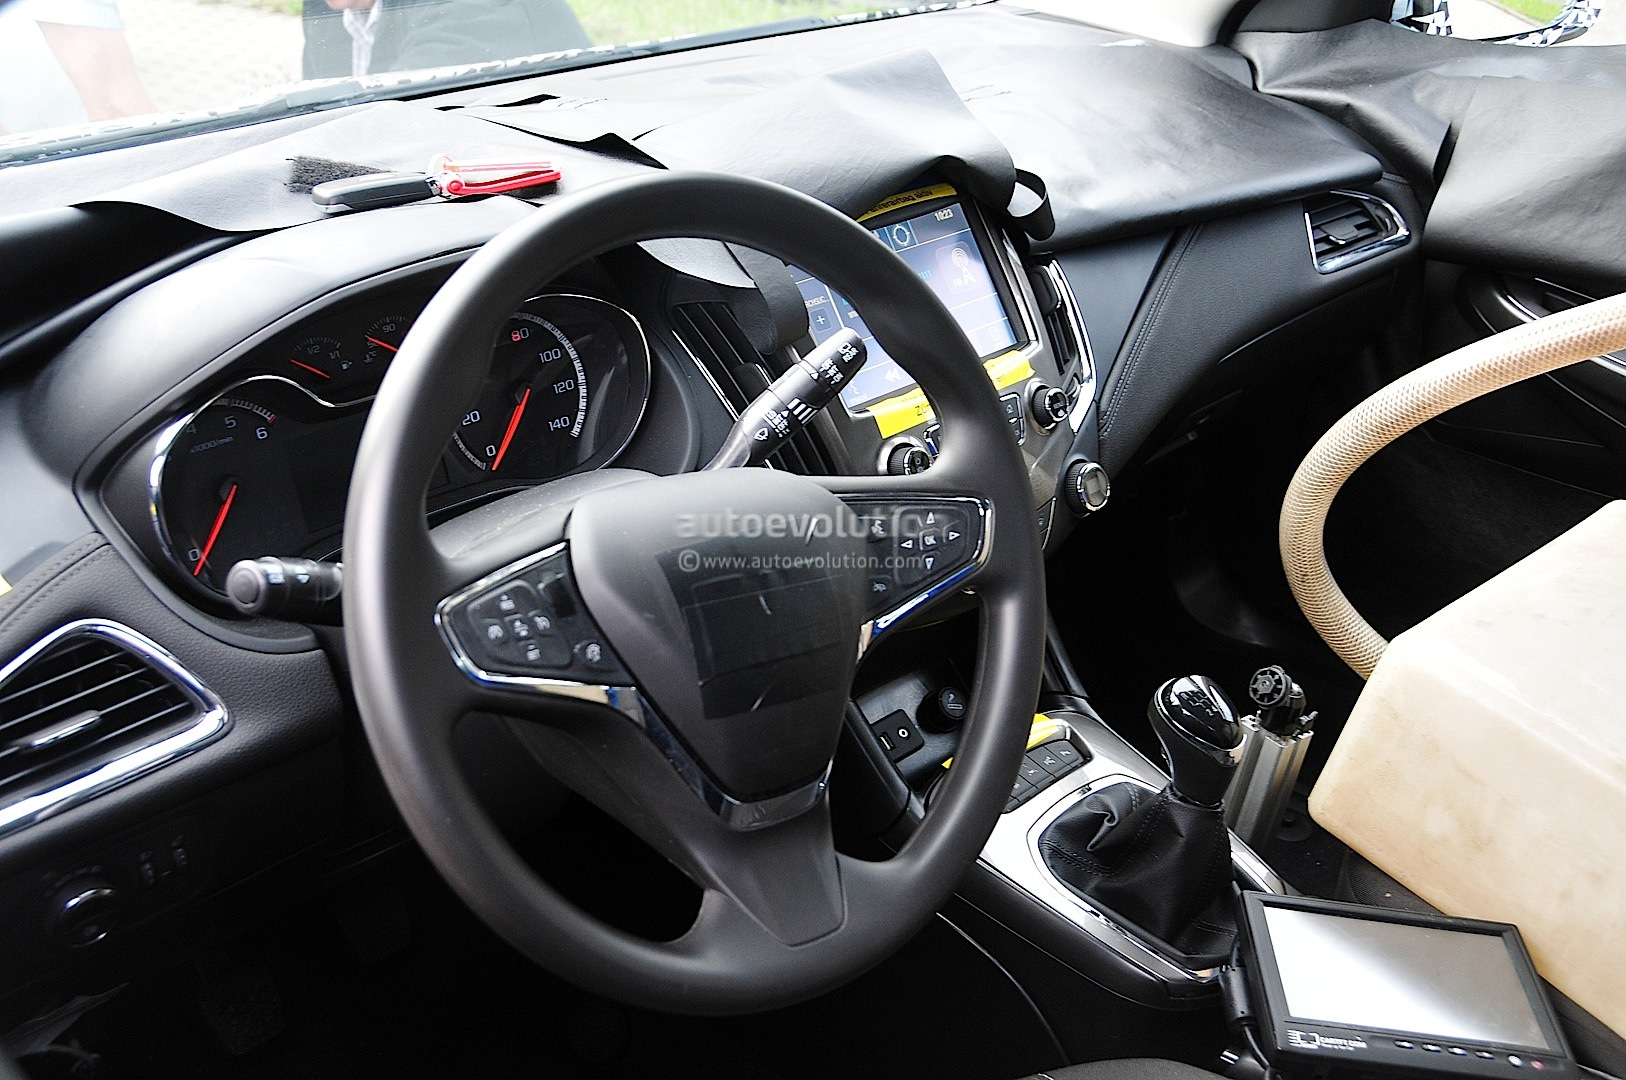 Cruze 2012 chevy cruze interior : Cruze Diesel with Stick?